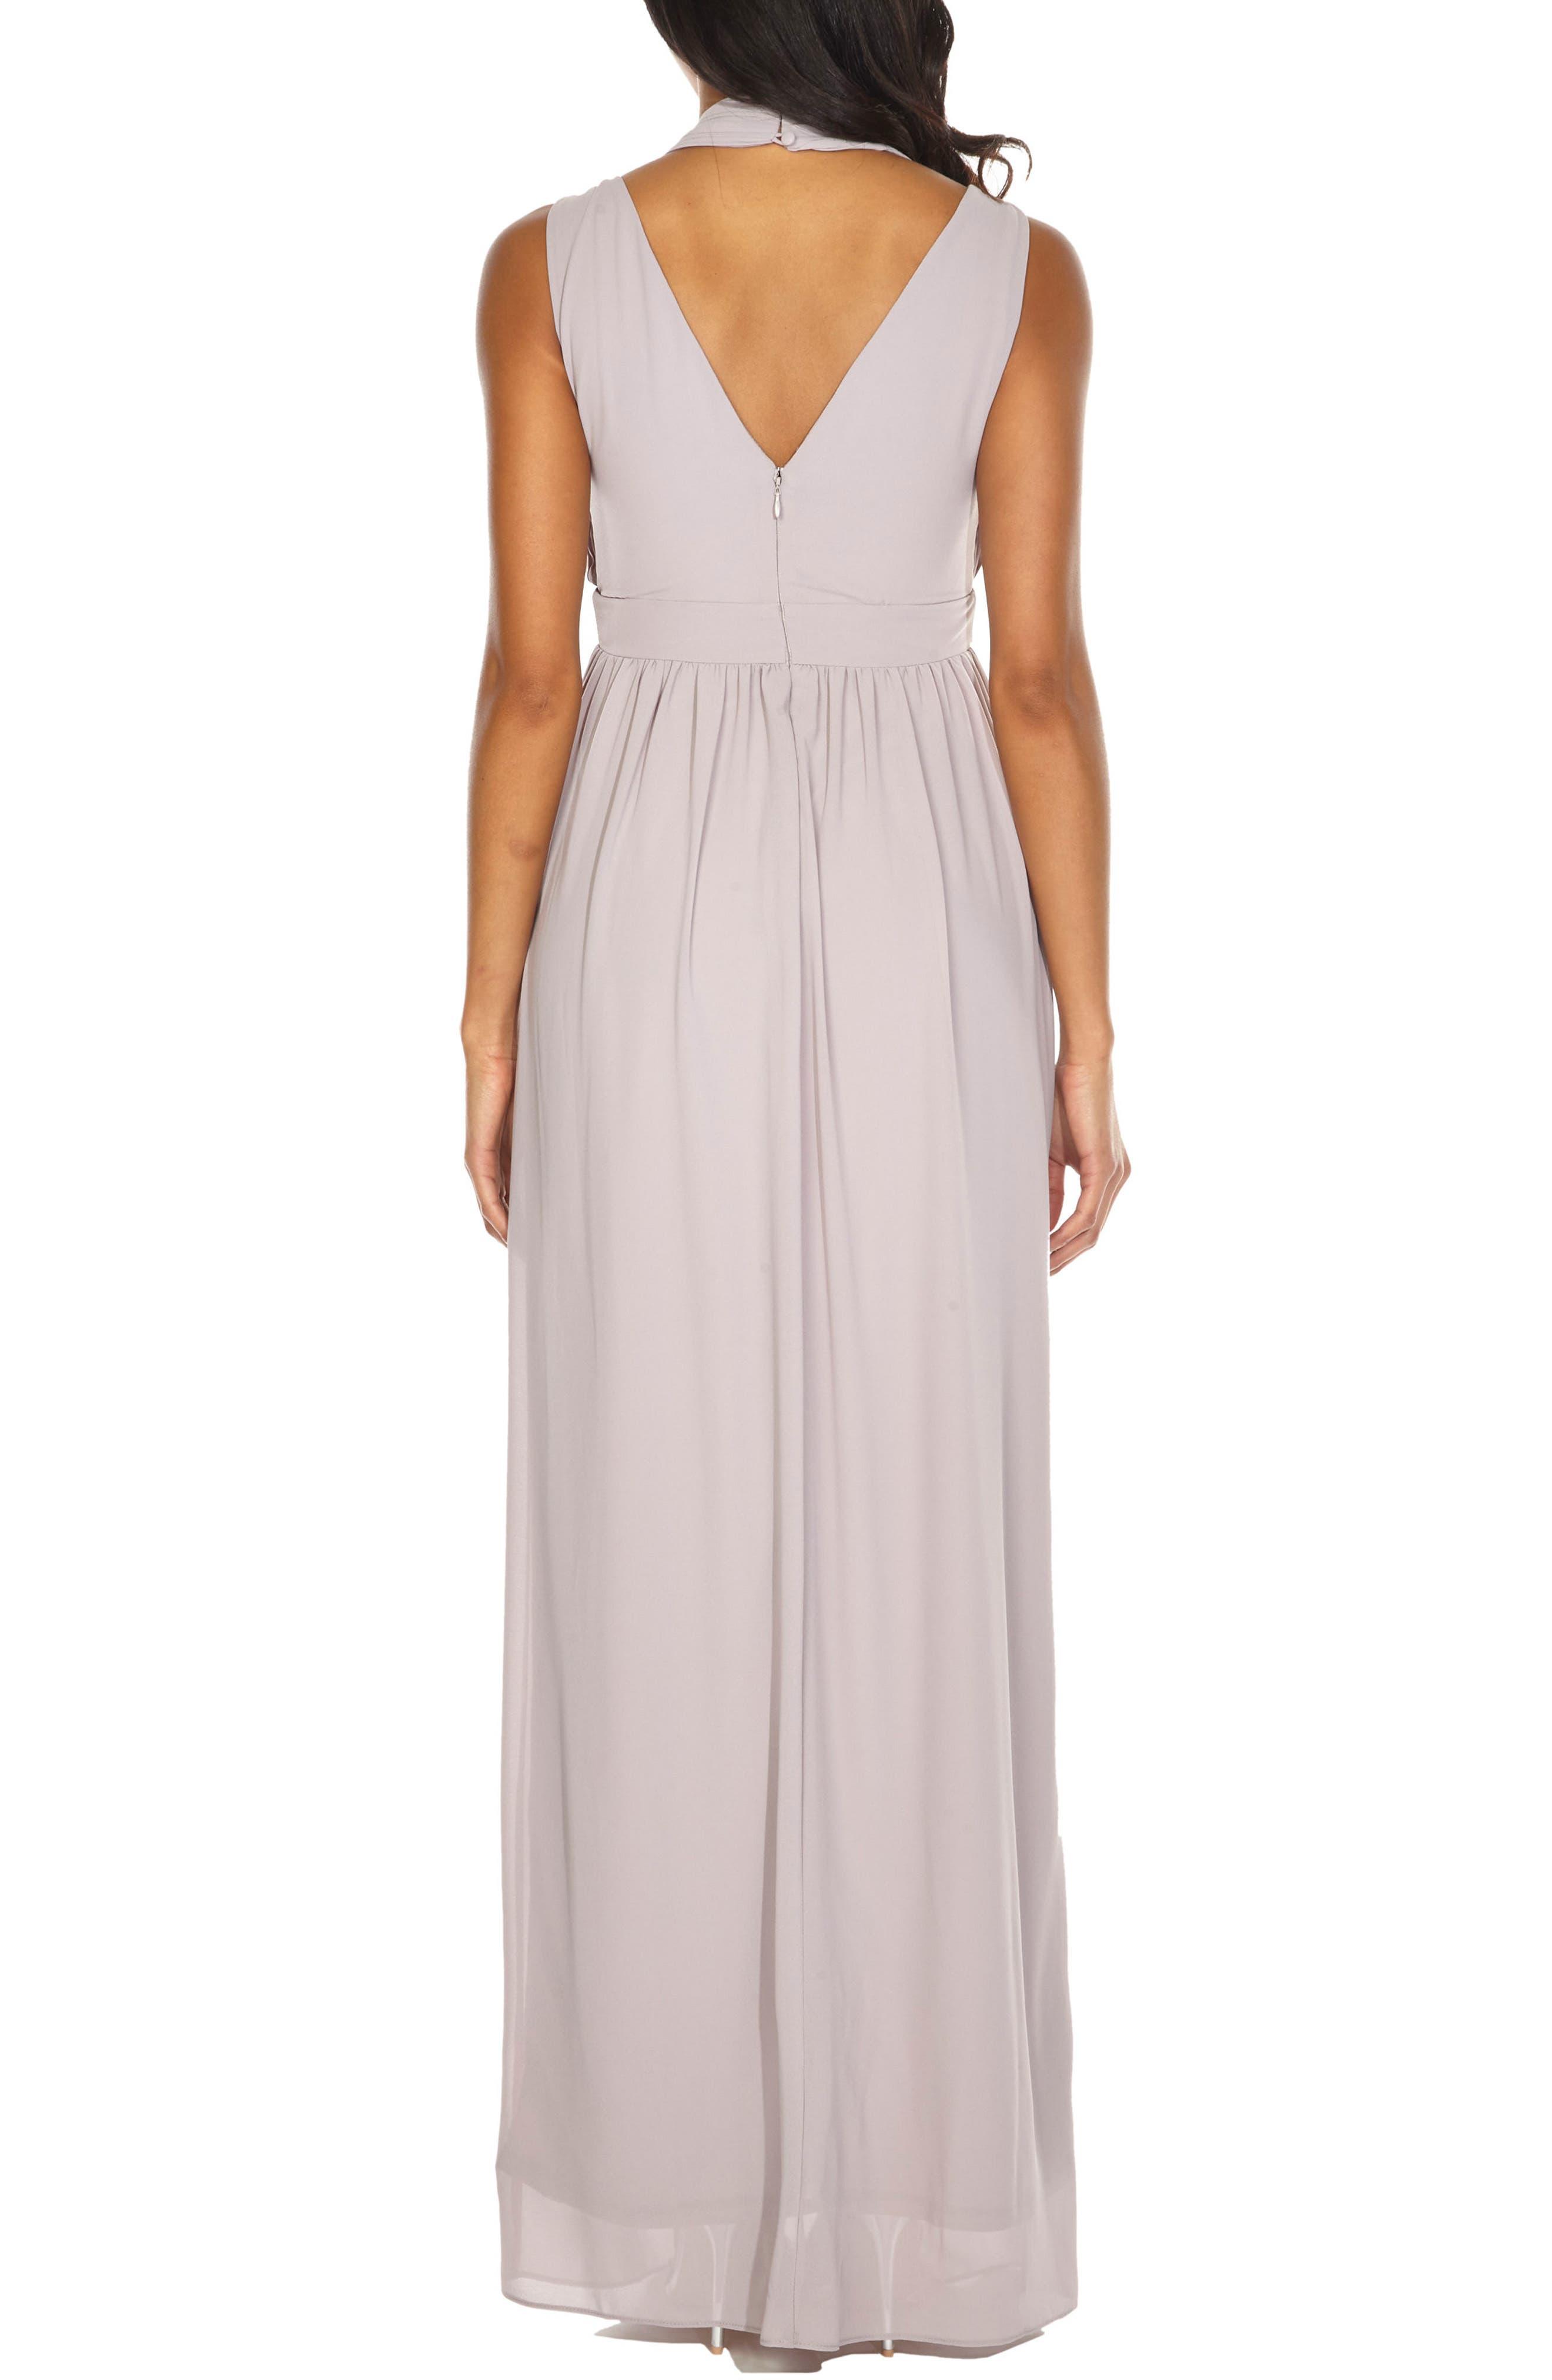 Arley Chiffon Gown,                             Alternate thumbnail 2, color,                             Lavender Fog